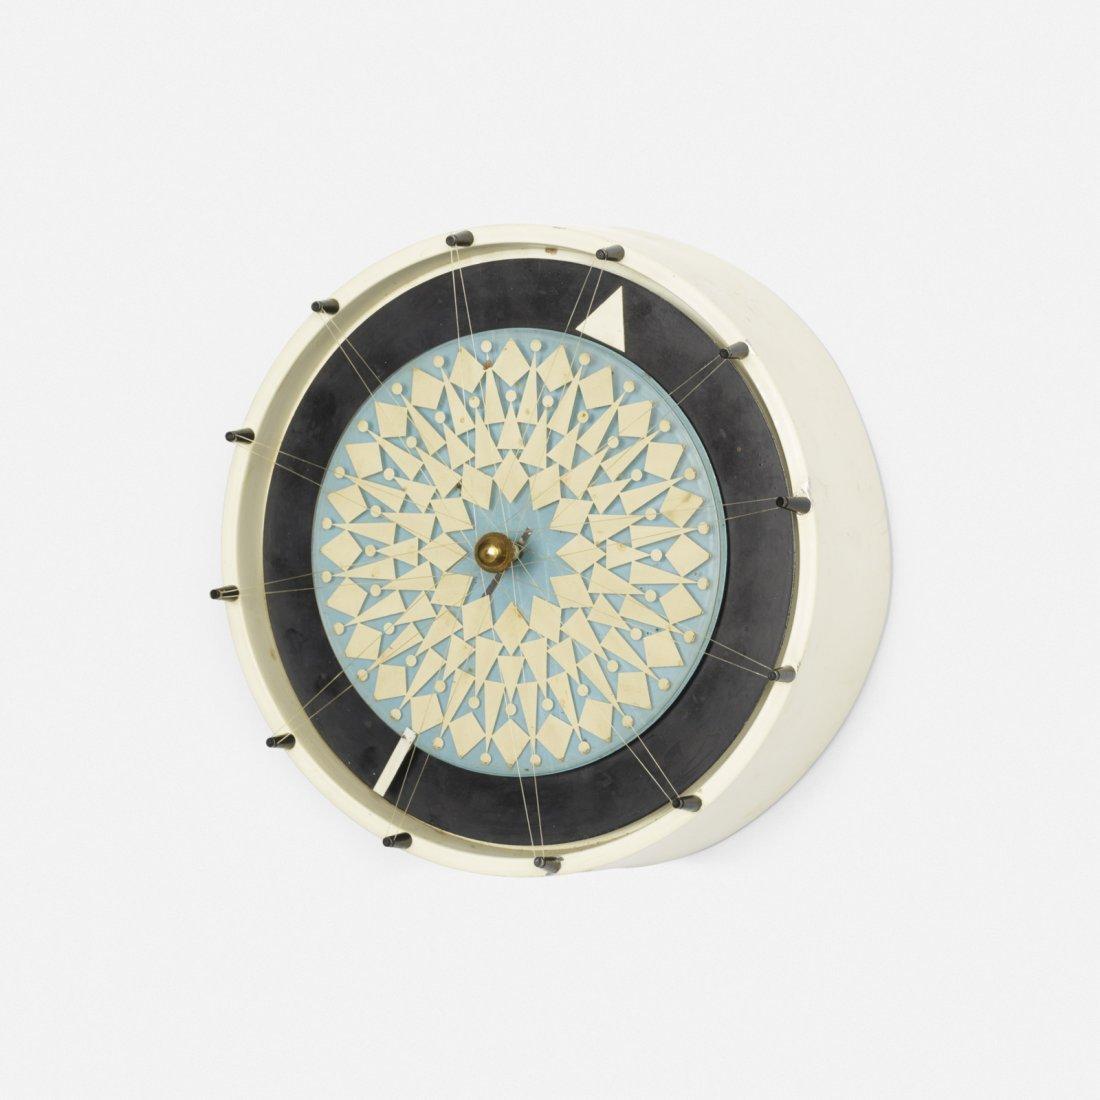 George Nelson & Assoc., Compass wall clock, model 2278